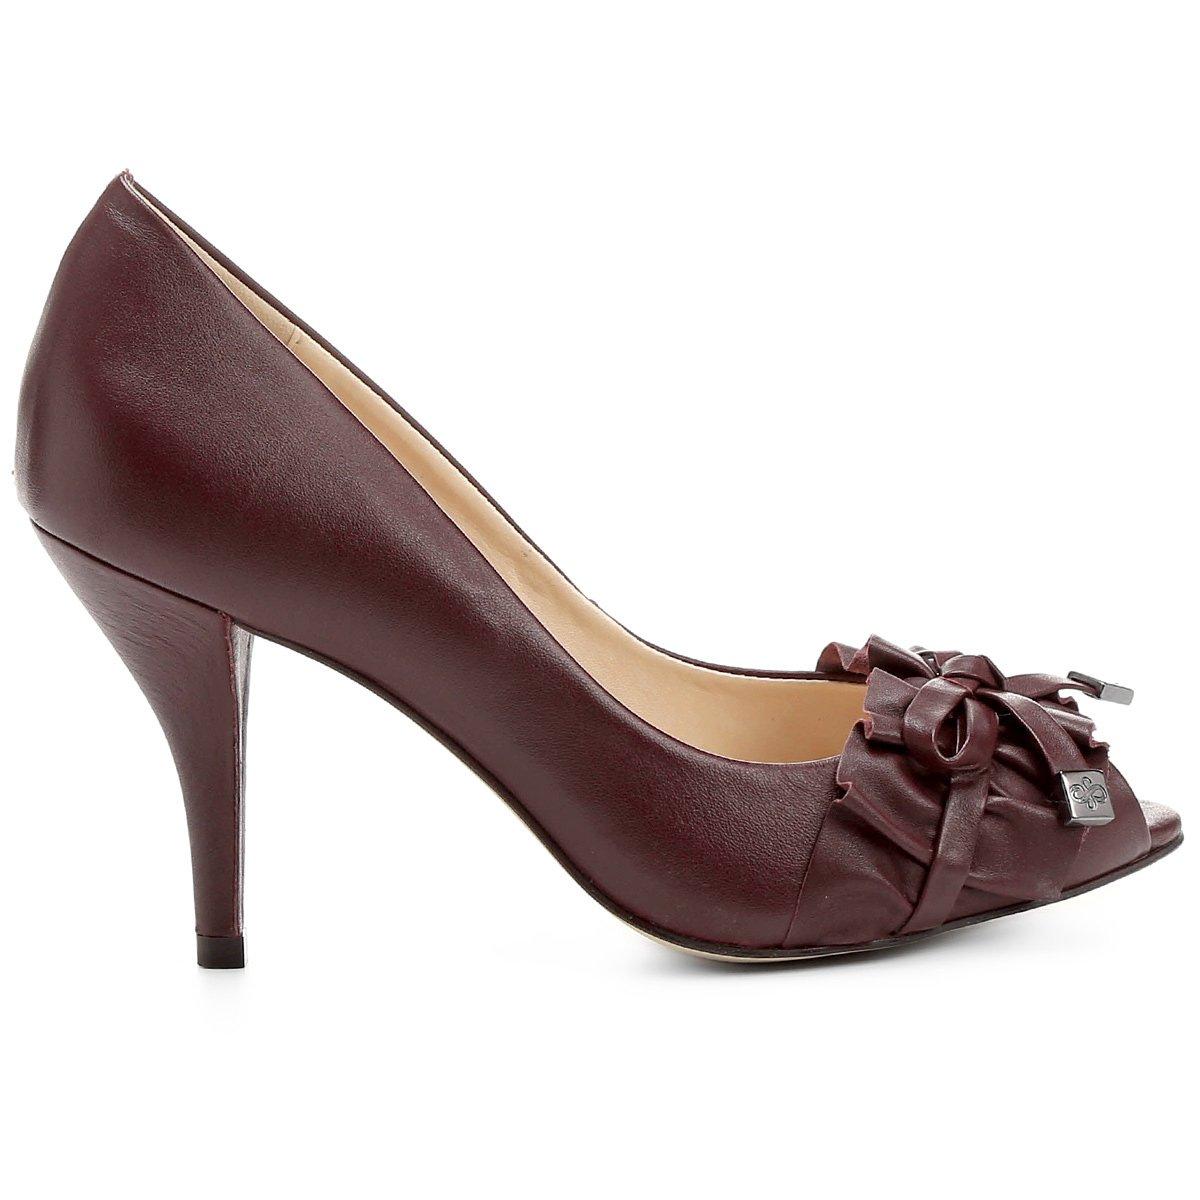 Peep Fino Babado Toe Peep Toe Couro Couro Shoestock Vinho Salto ORqpA5wn